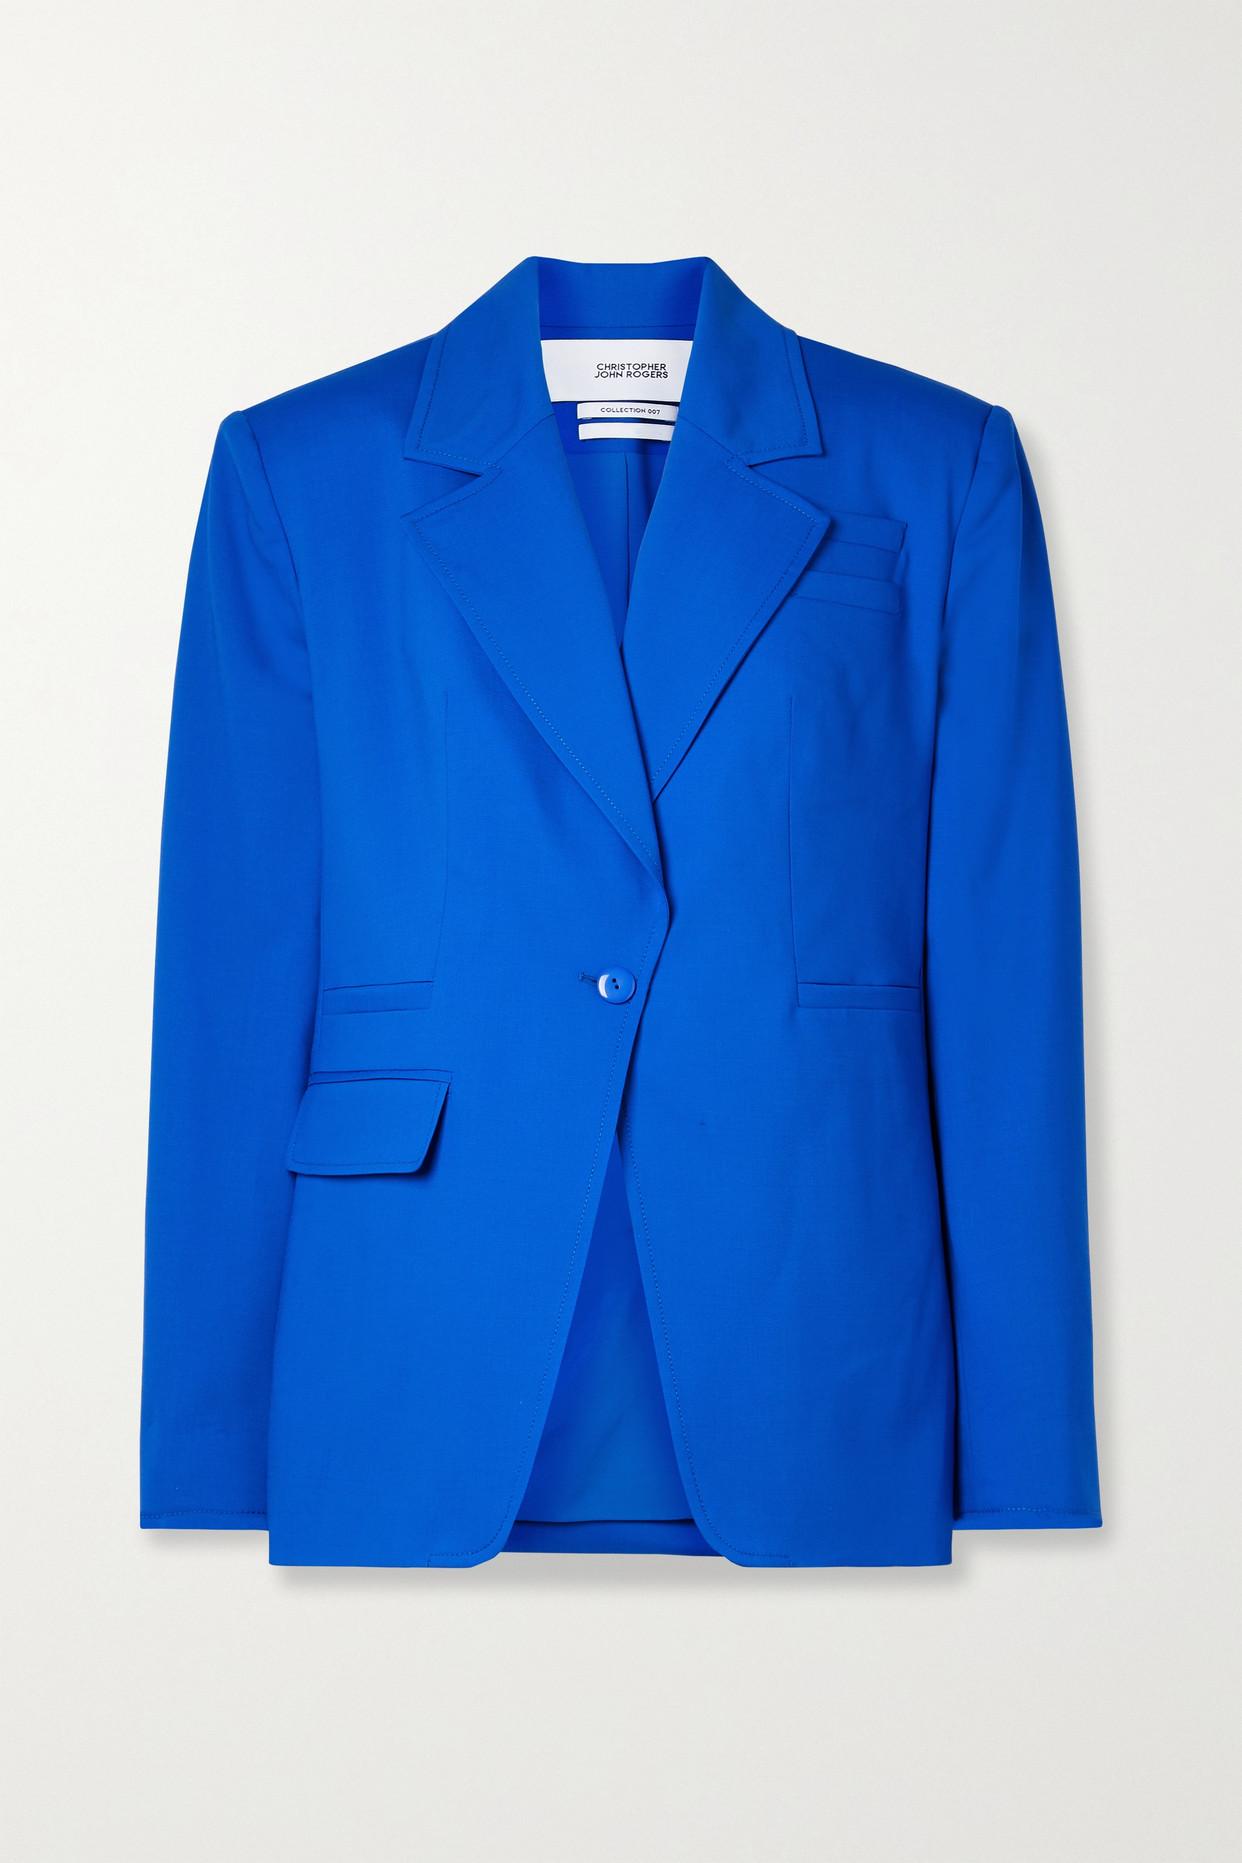 CHRISTOPHER JOHN ROGERS - 羊毛混纺西装外套 - 蓝色 - US4